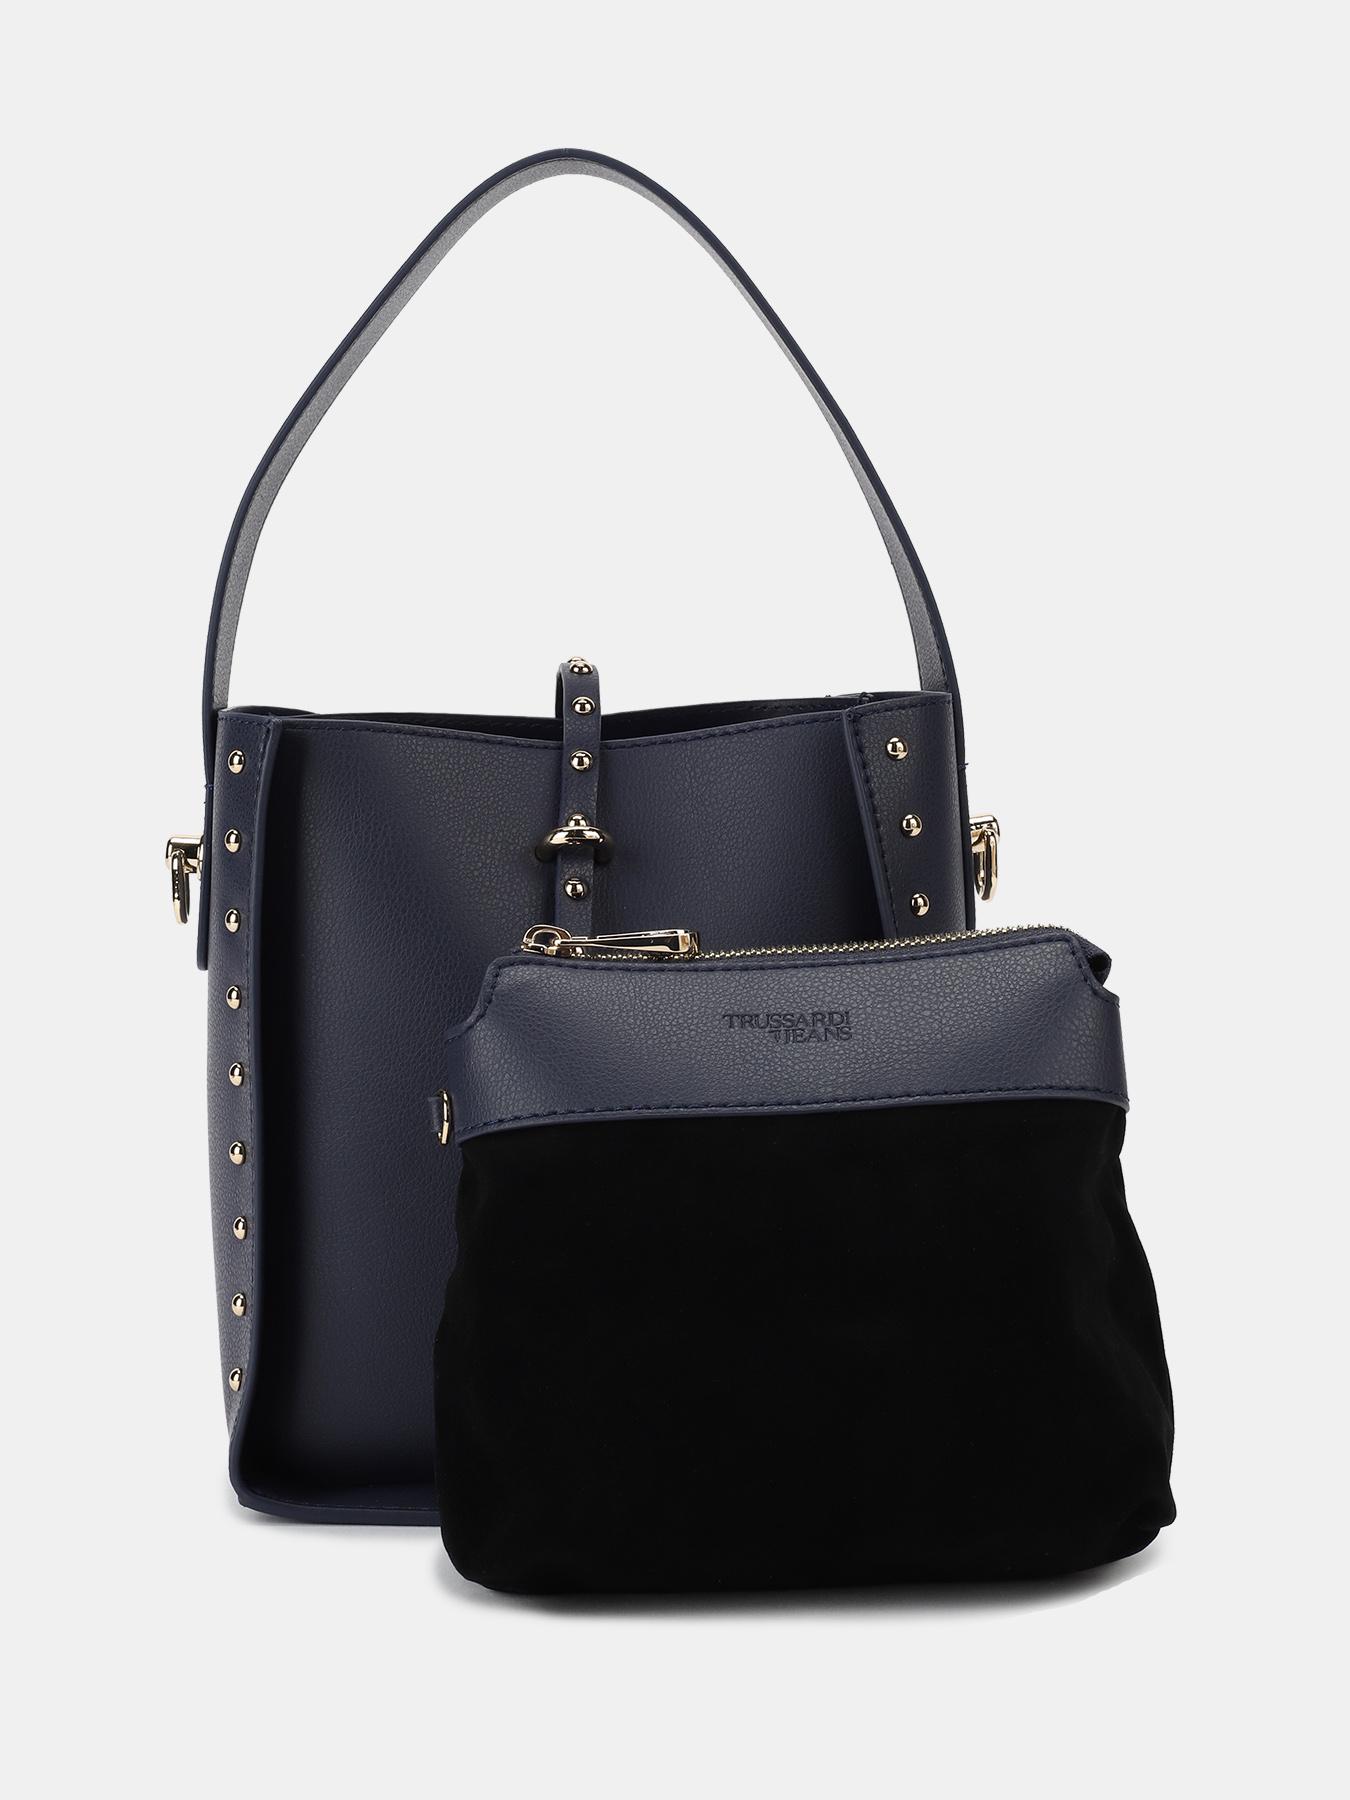 Trussardi Jeans Женская сумка 2 в 1 365205-185 Фото 5